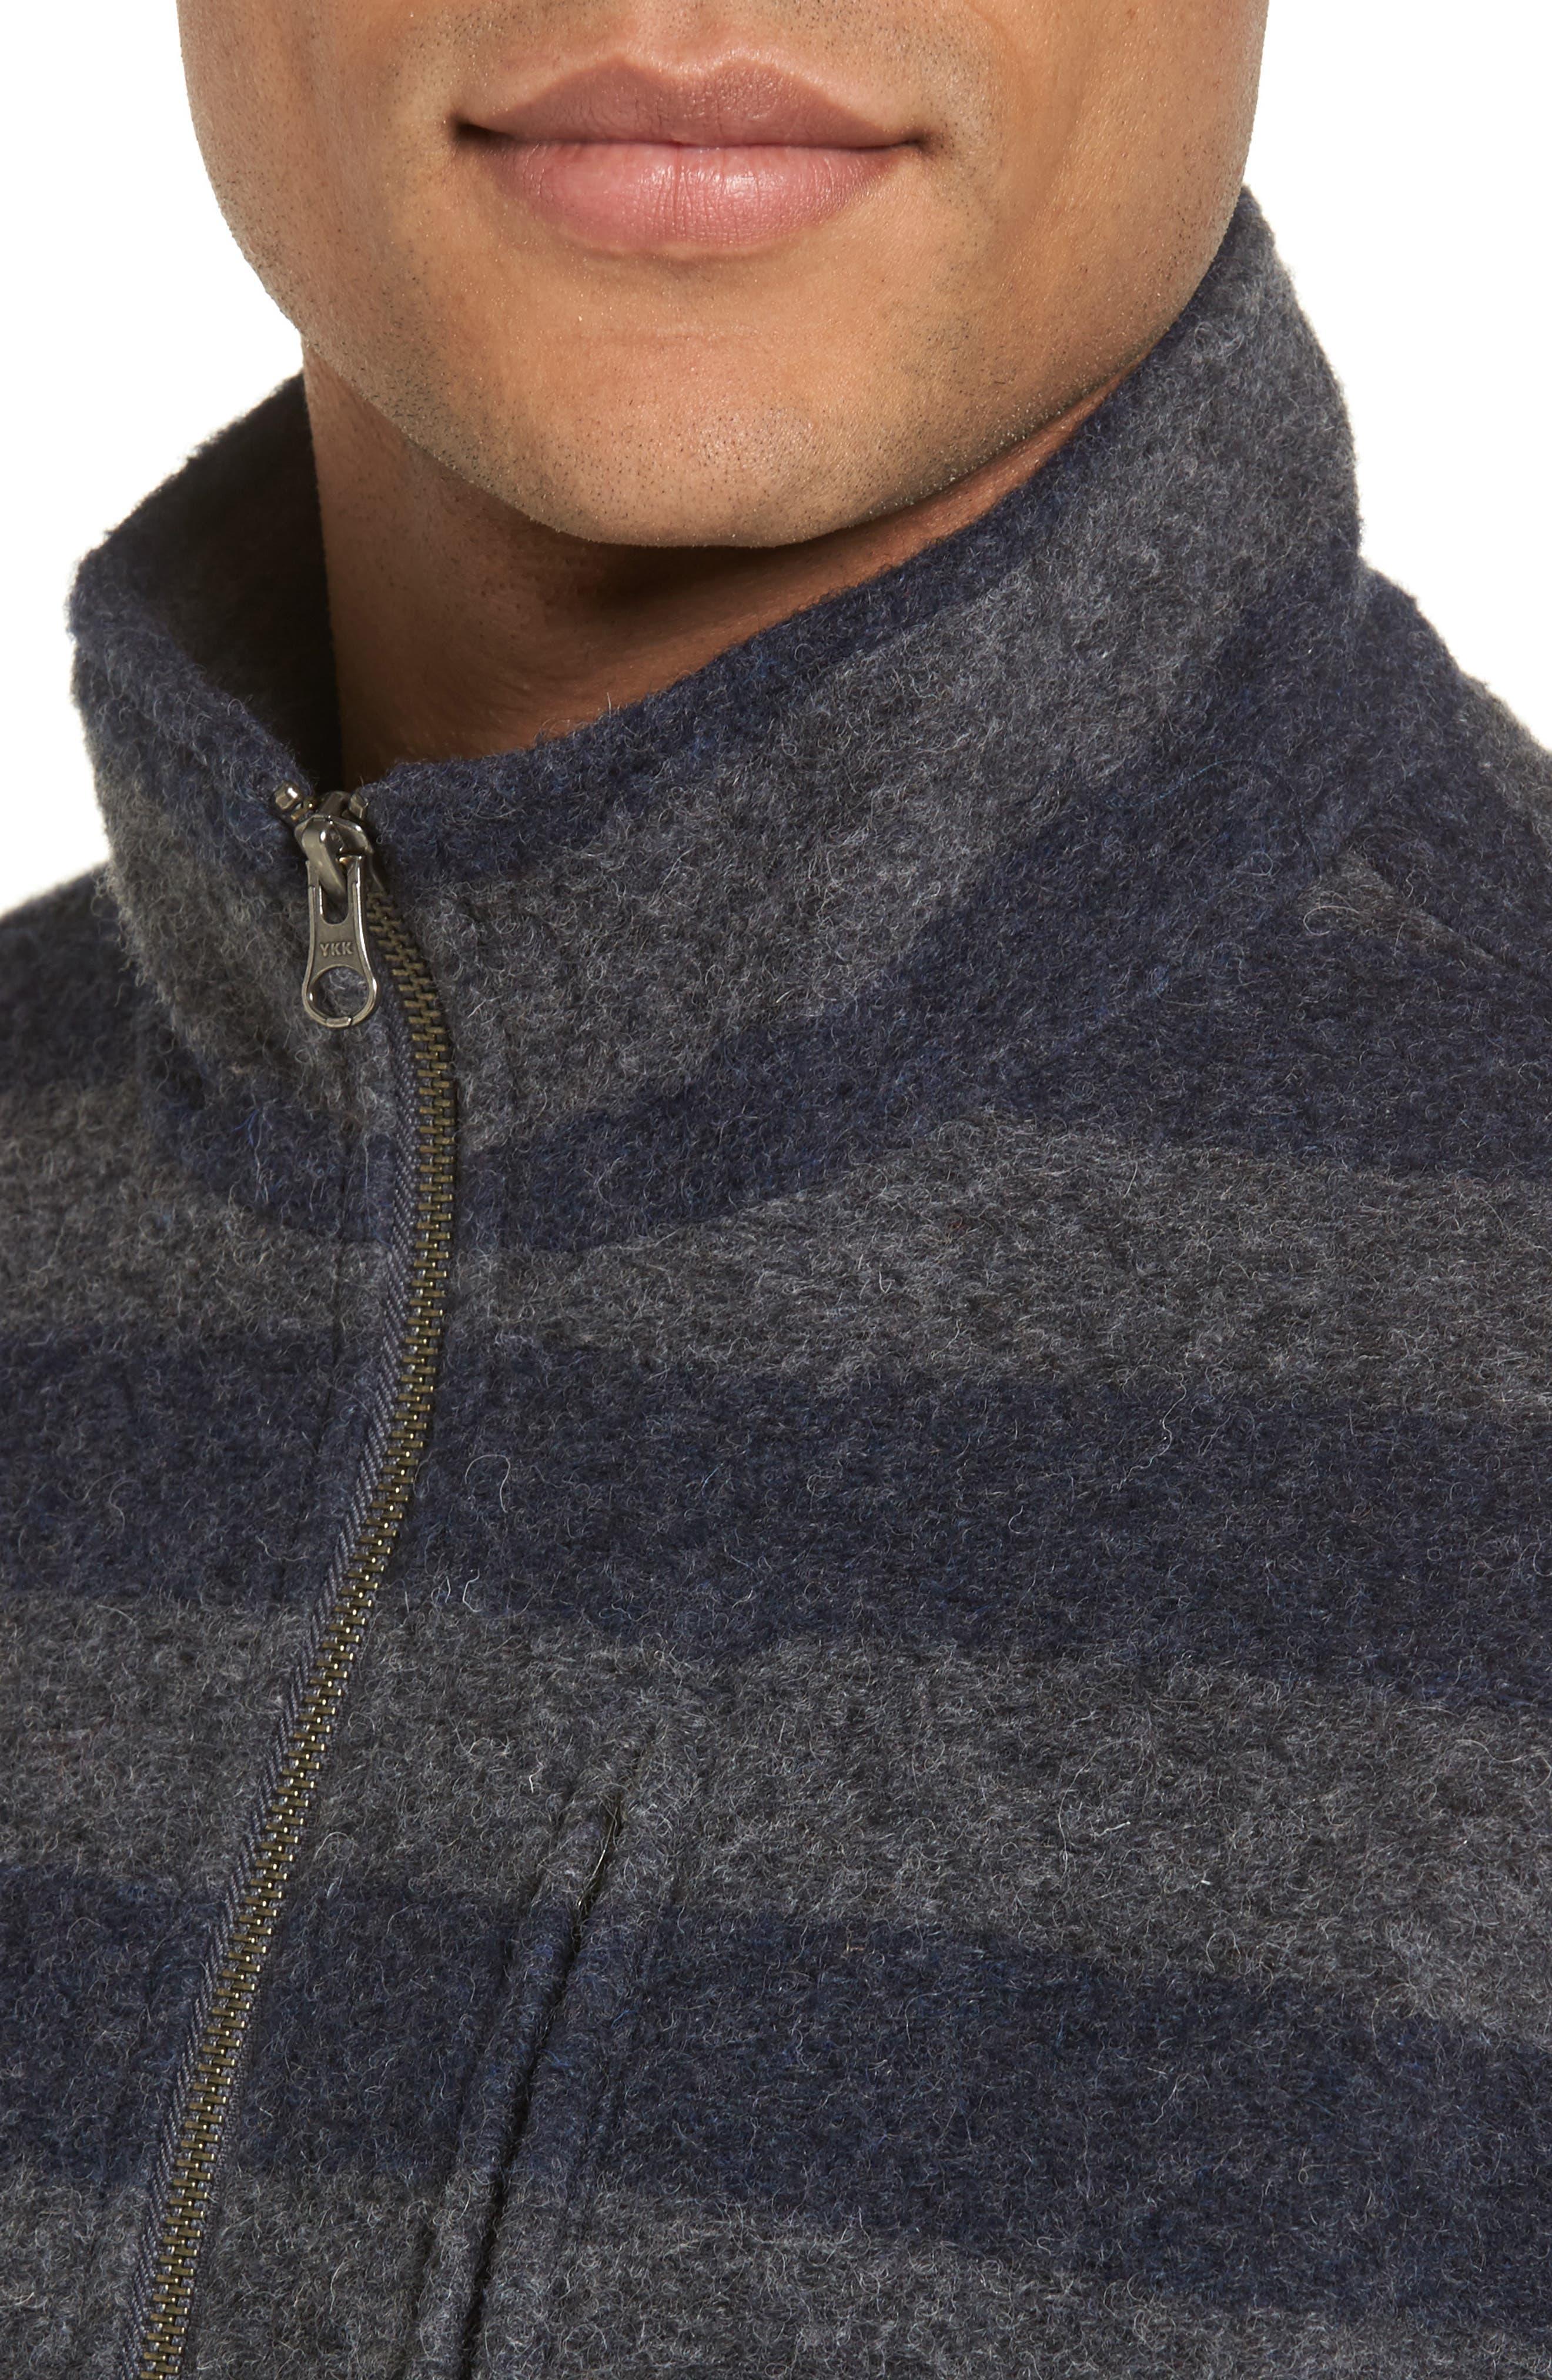 Bowen Stripe Zip Front Jacket,                             Alternate thumbnail 4, color,                             Grey Navy Stripe